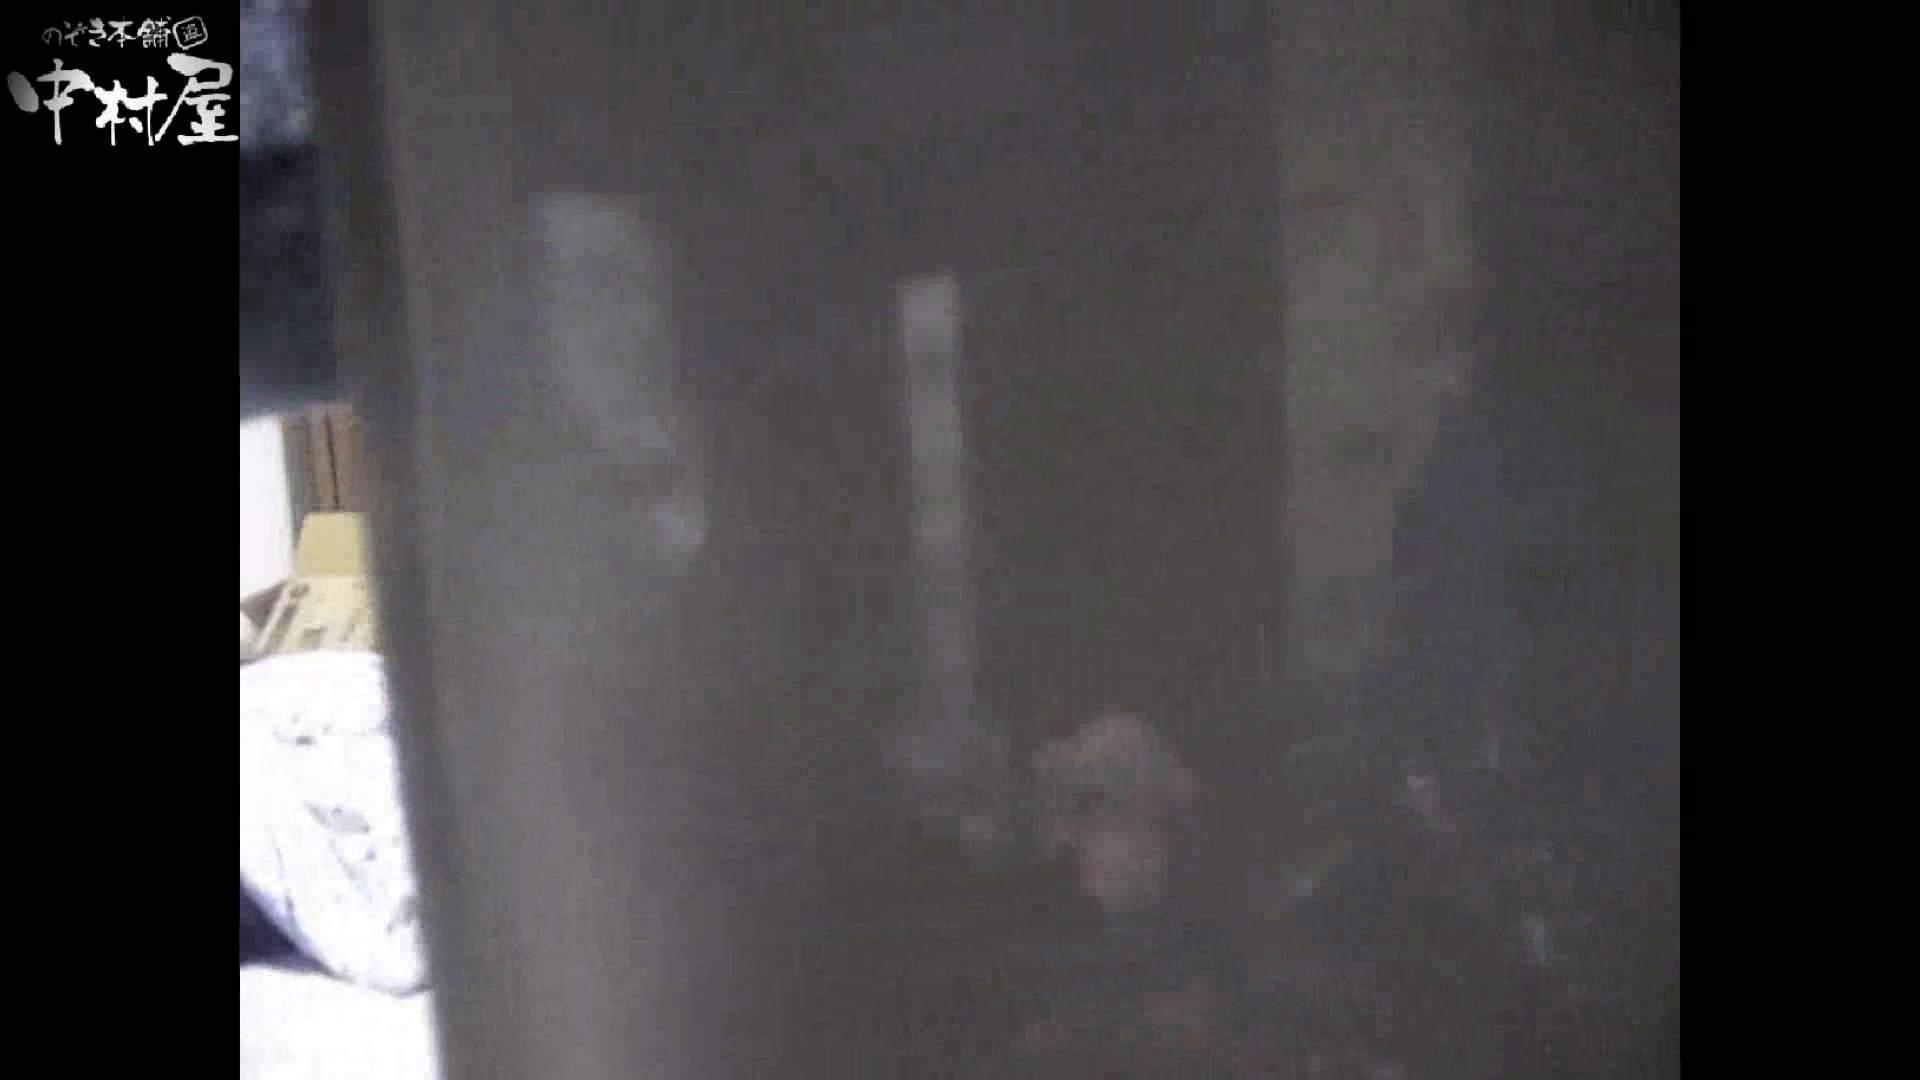 民家風呂専門盗撮師の超危険映像 vol.021 美女ヌード  65画像 54